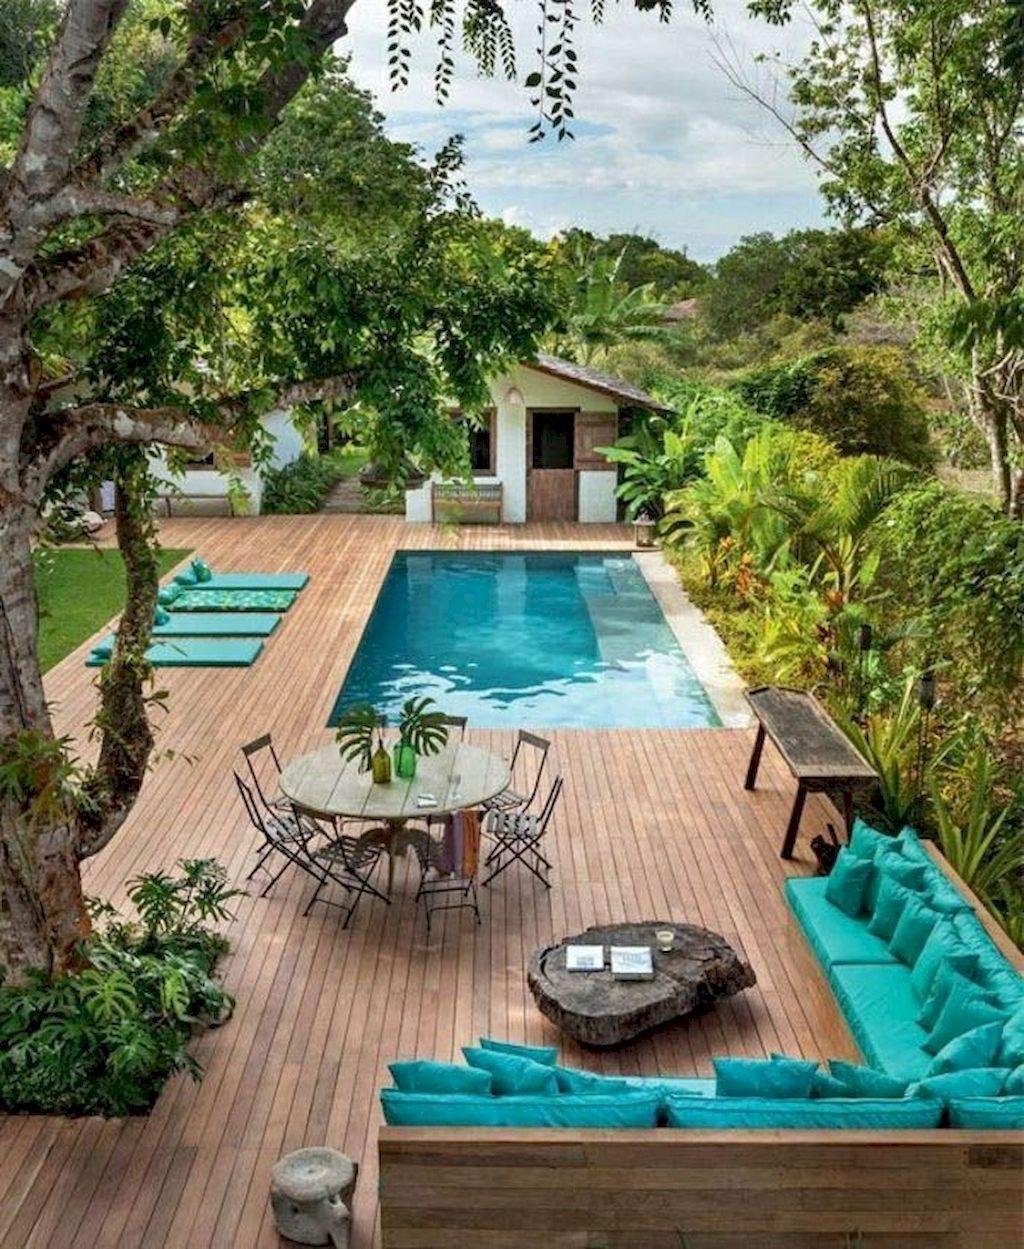 Fabulous Swimming Pool Designs Beautiful And Enjoyment Small Pool Design Backyard Small Backyard Landscaping